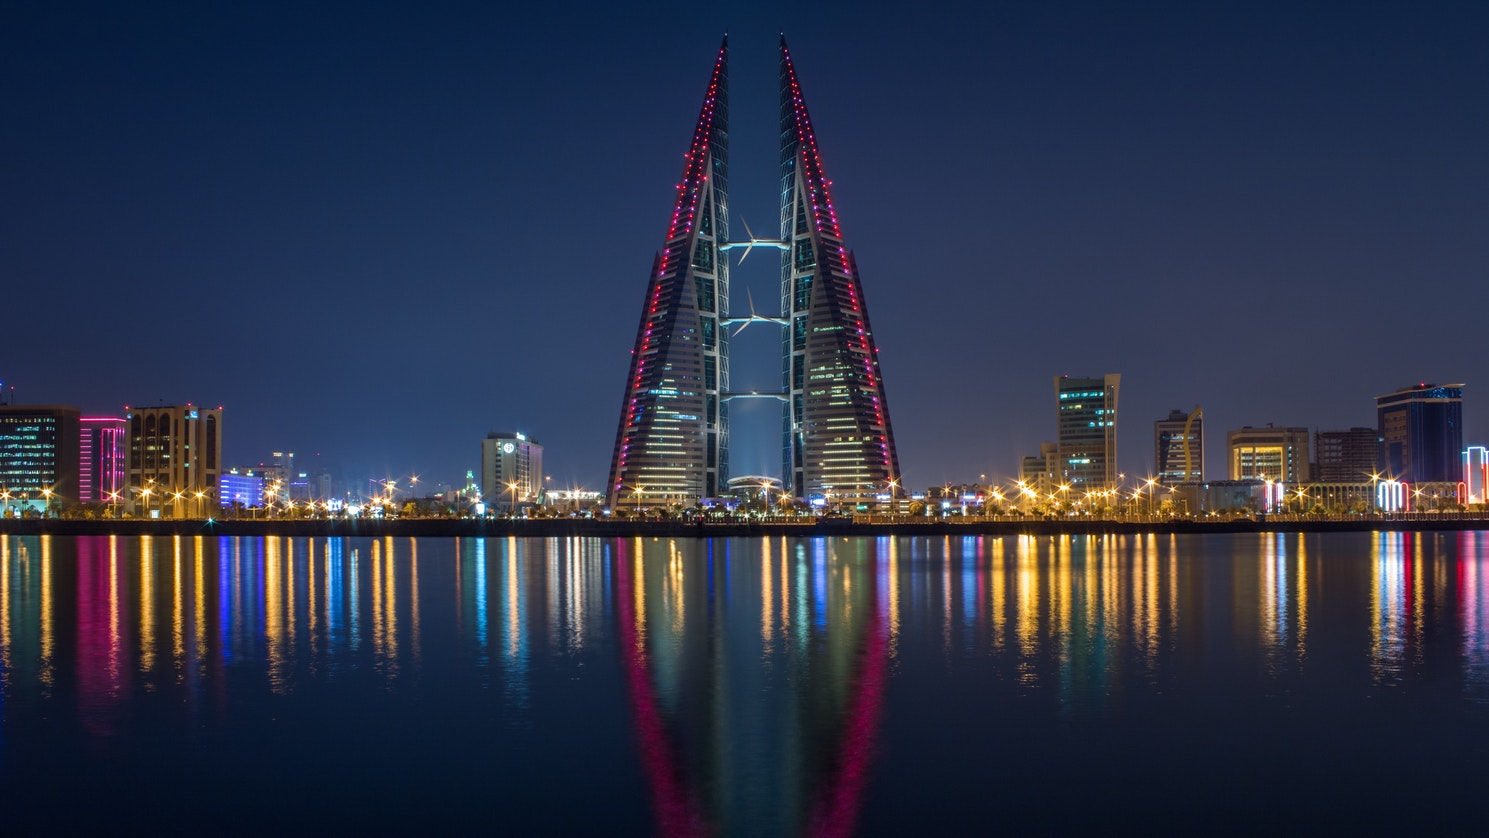 Обмисляте пътуване до Кралство Бахрейн?